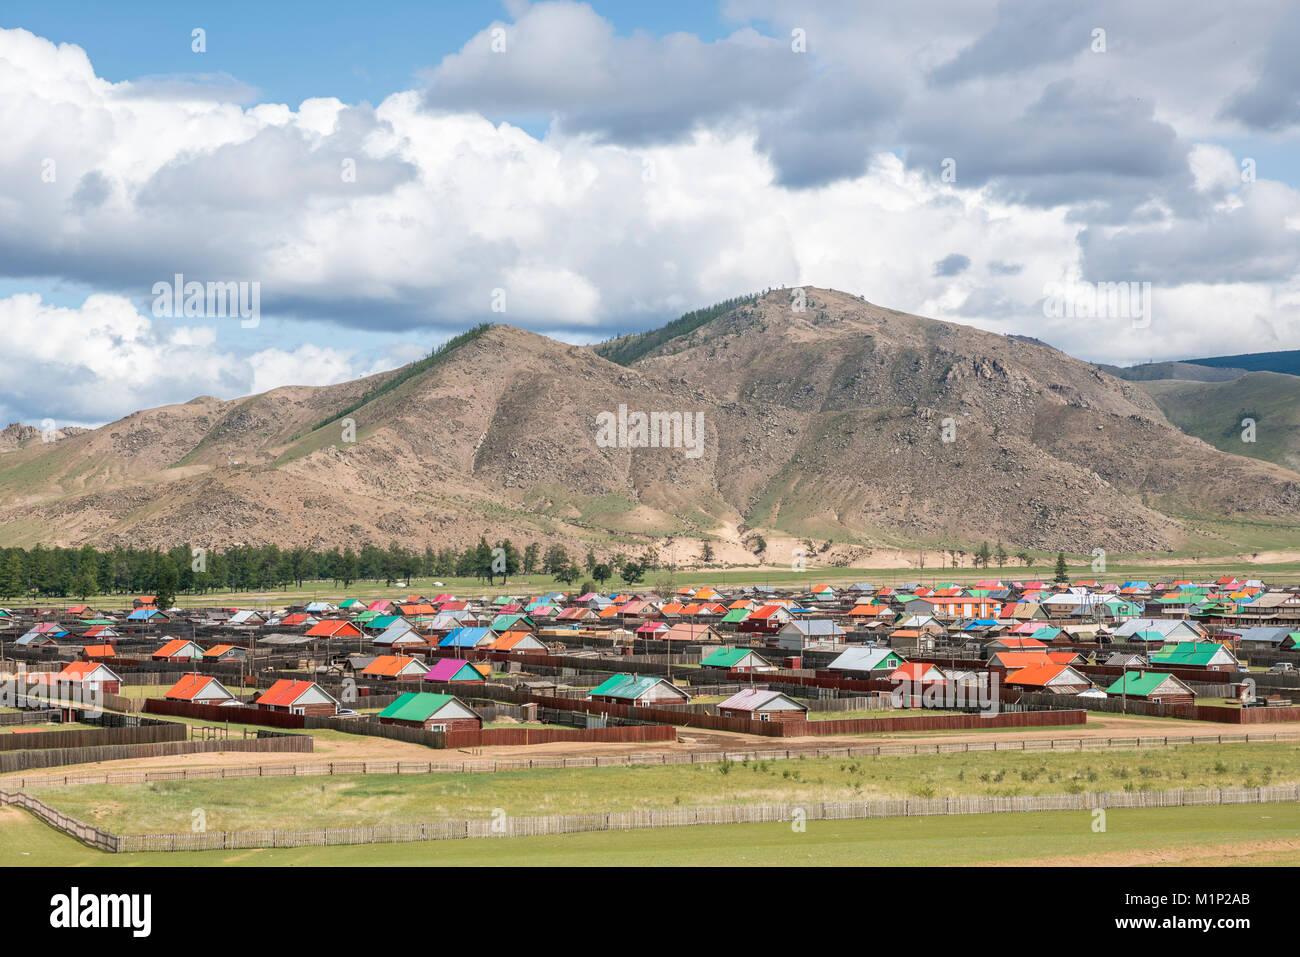 La ciudad de Jargalant Orgil, distrito, provincia Hovsgol, Mongolia, Asia Central, África Imagen De Stock